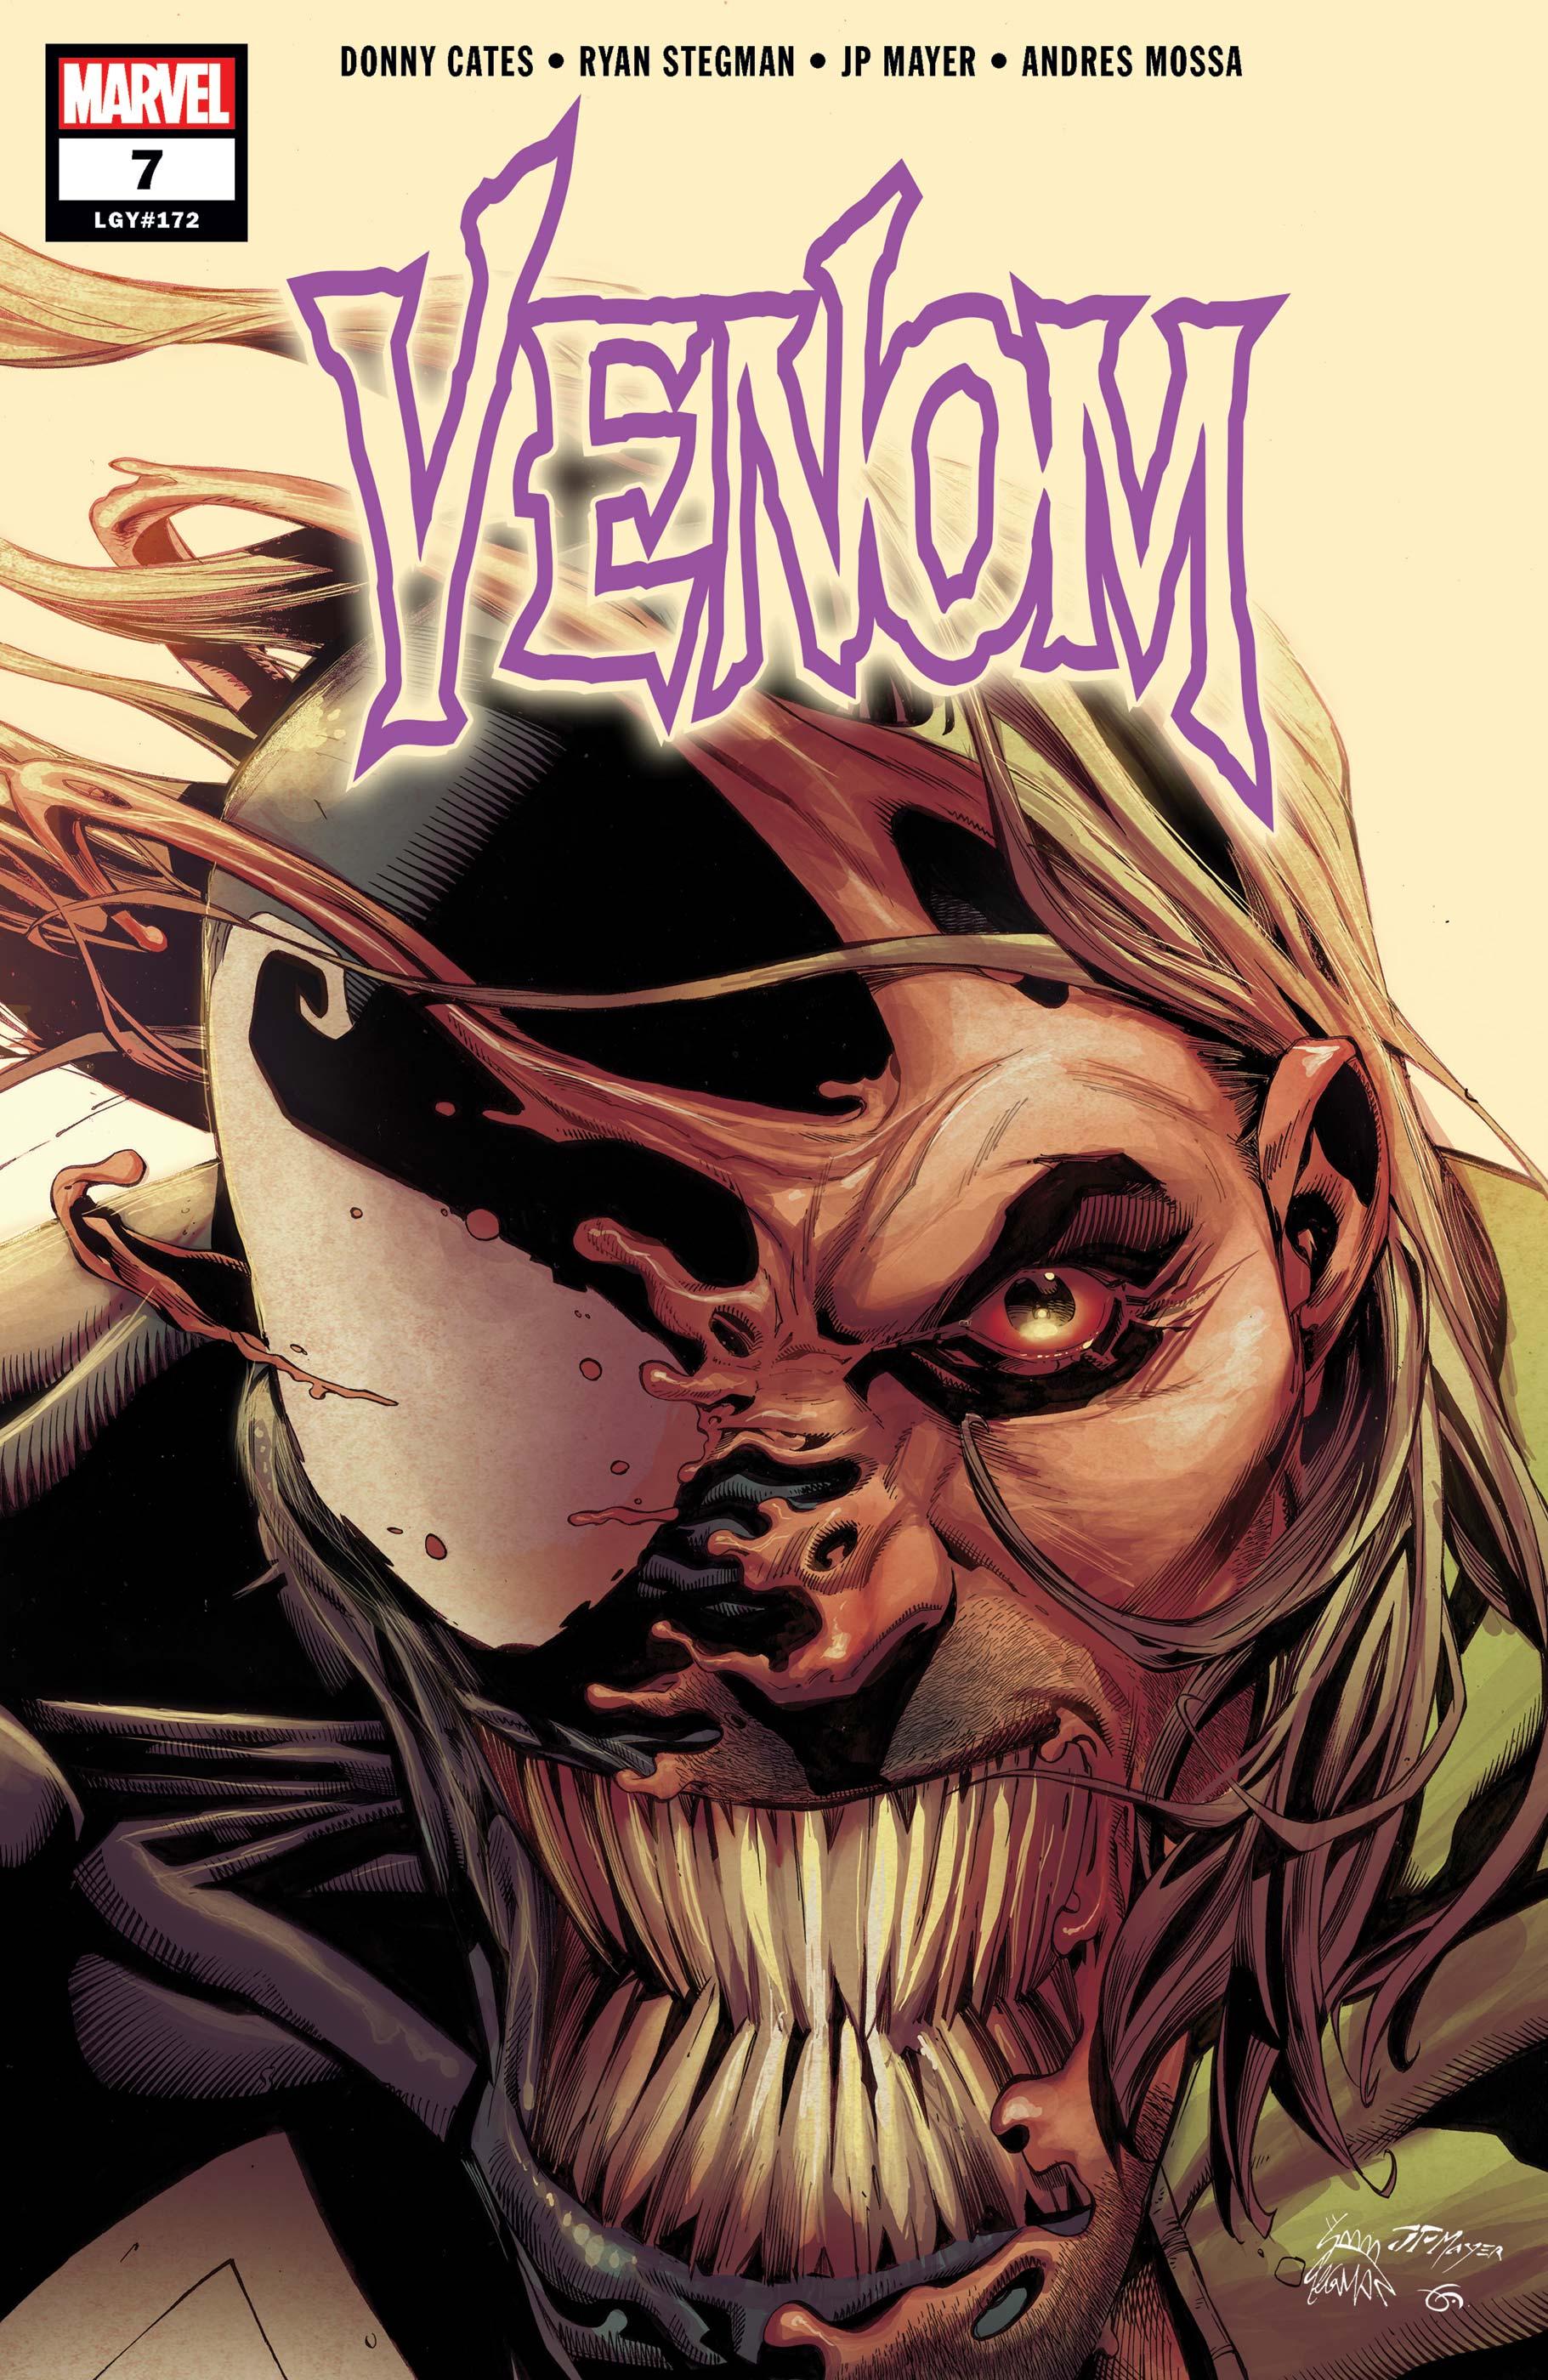 Venom (2018) #7